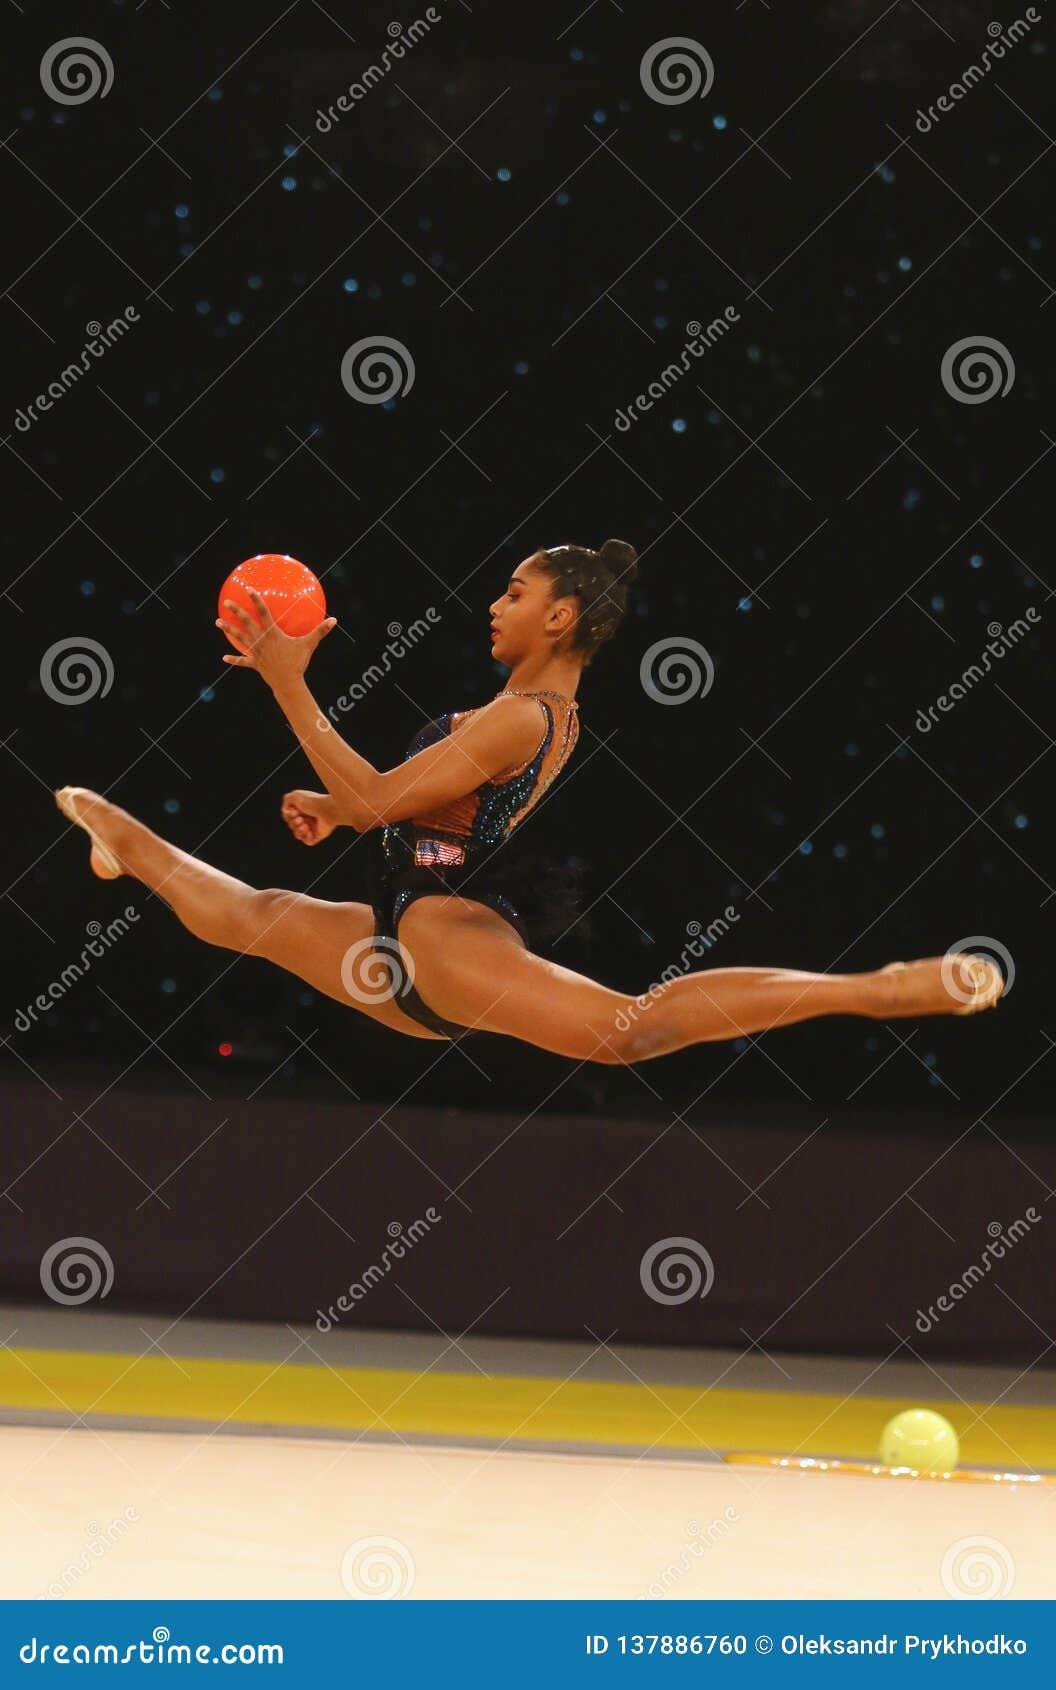 Rytmiczna gimnastyka Grand Prix w Kyiv, Ukraina